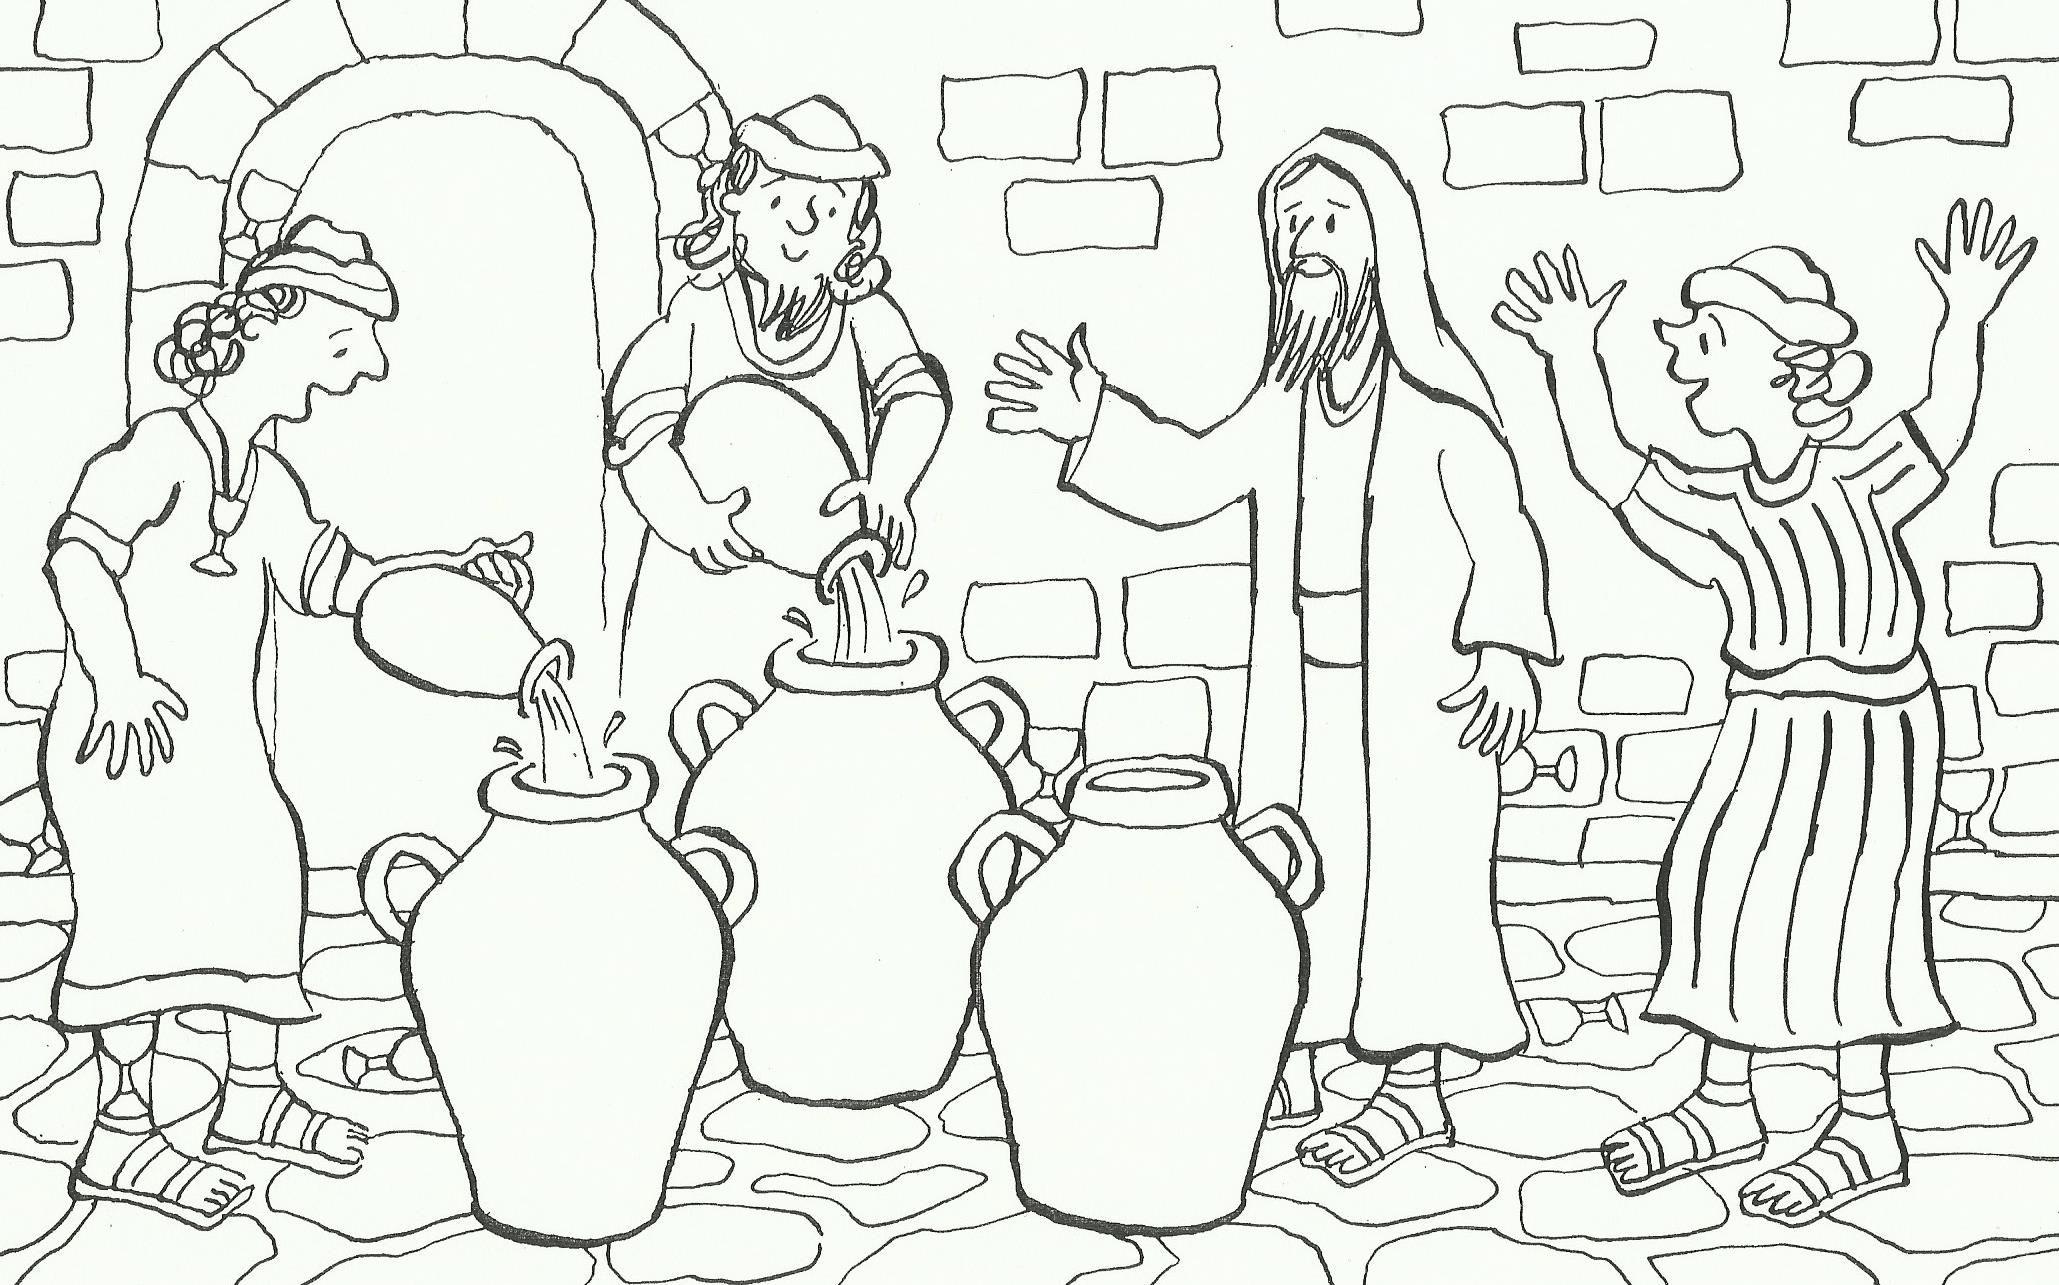 Pin By Aniko Takacsne Kiss On Bibliai Interaktiv Bible Crafts Church Crafts Water Into Wine